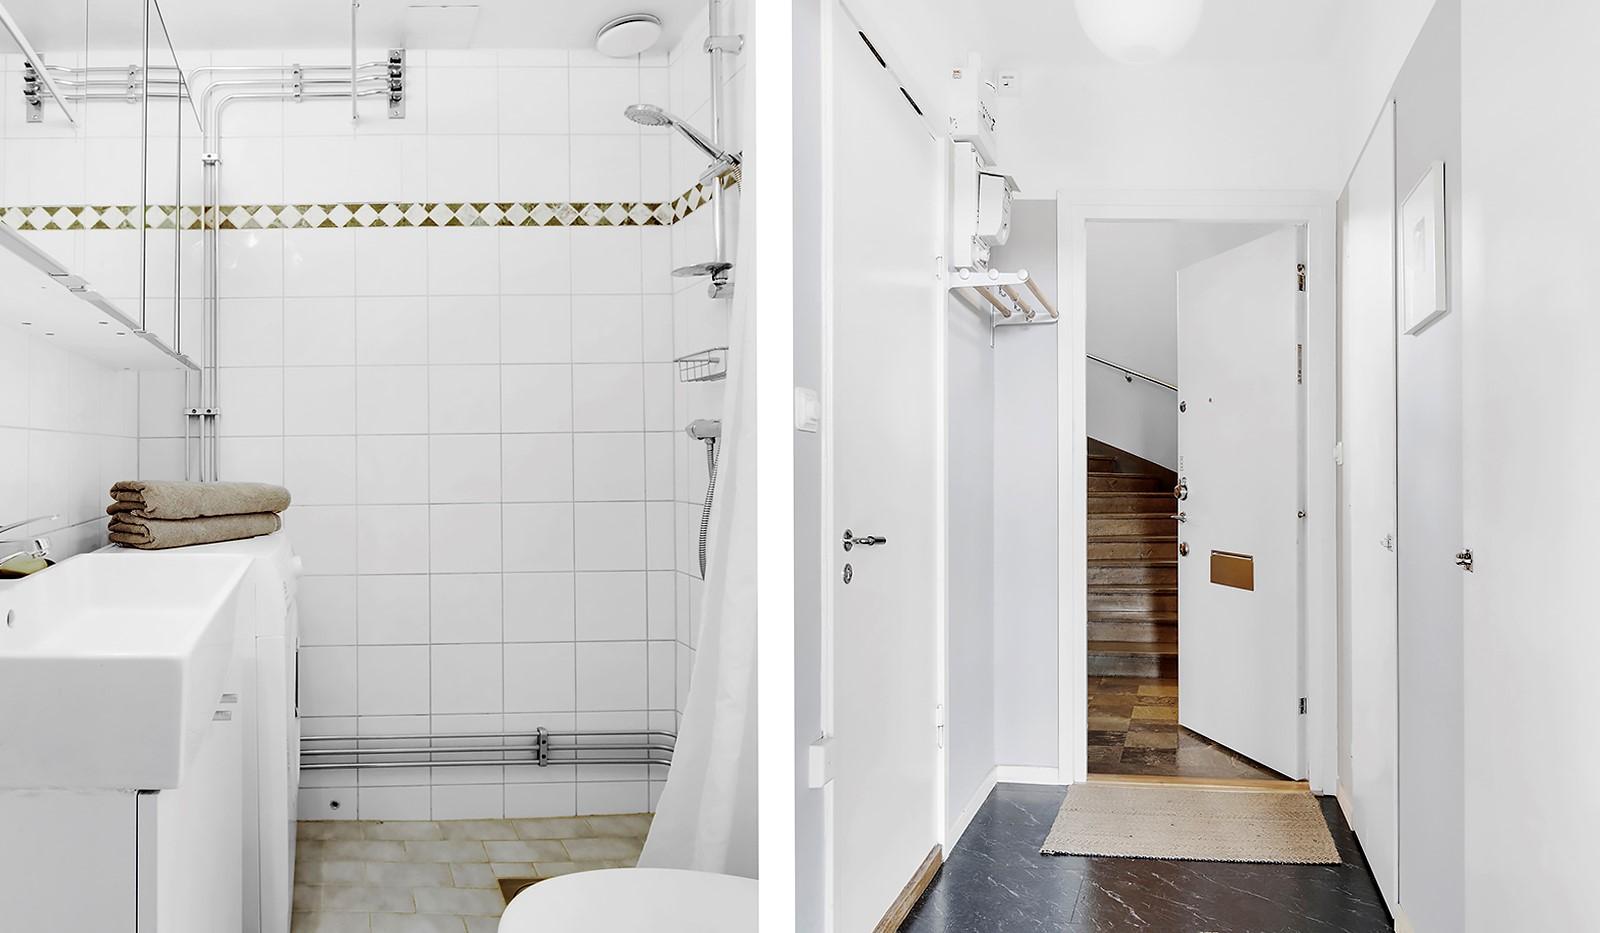 Heleneborgsgatan 20 - Badrum med tvättmaskin